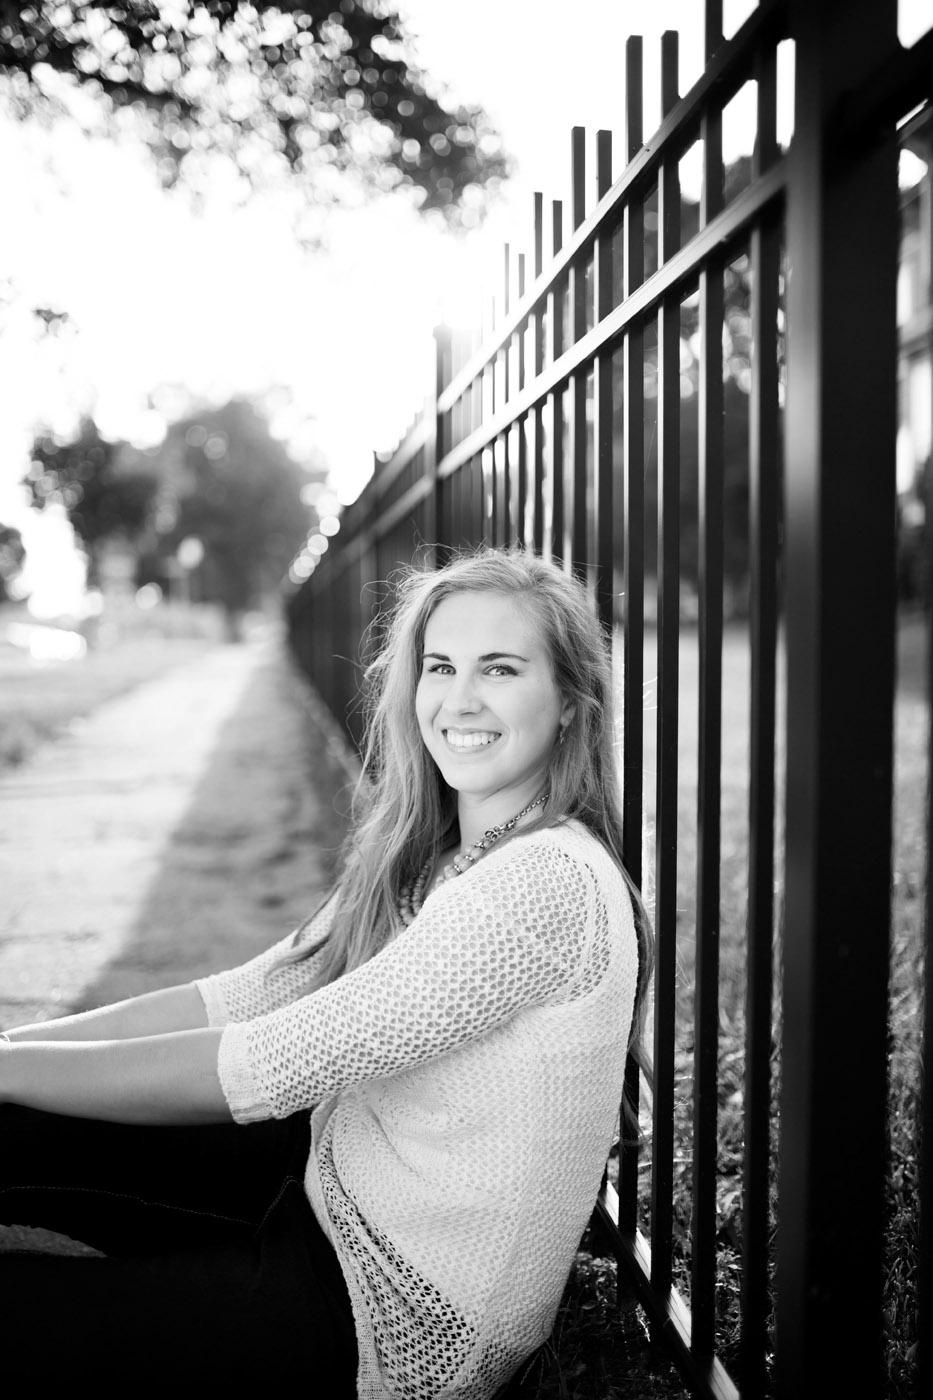 Emily Wortman 016 (2).jpg